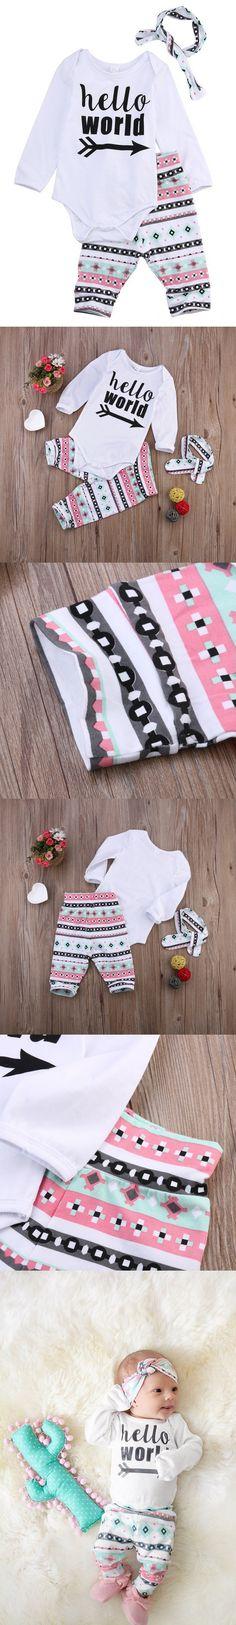 3Pcs/Set!Newborn baby girls clothing sets spring Autumn Long Sleeve Romper +Long Pants+Headband Outfits Clothes Sets